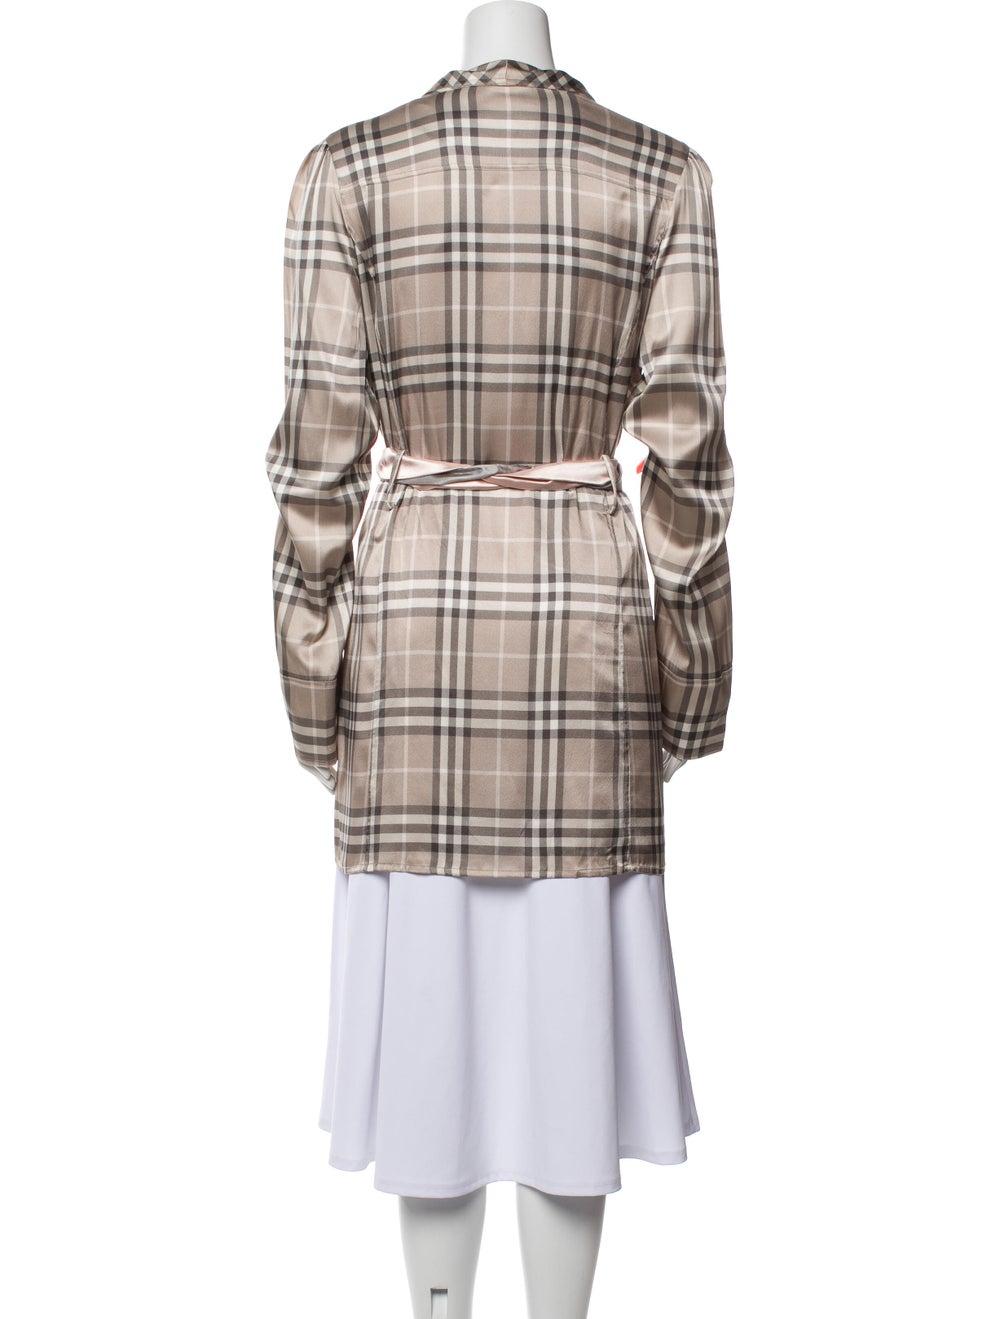 Burberry Silk Plaid Print Robe - image 3